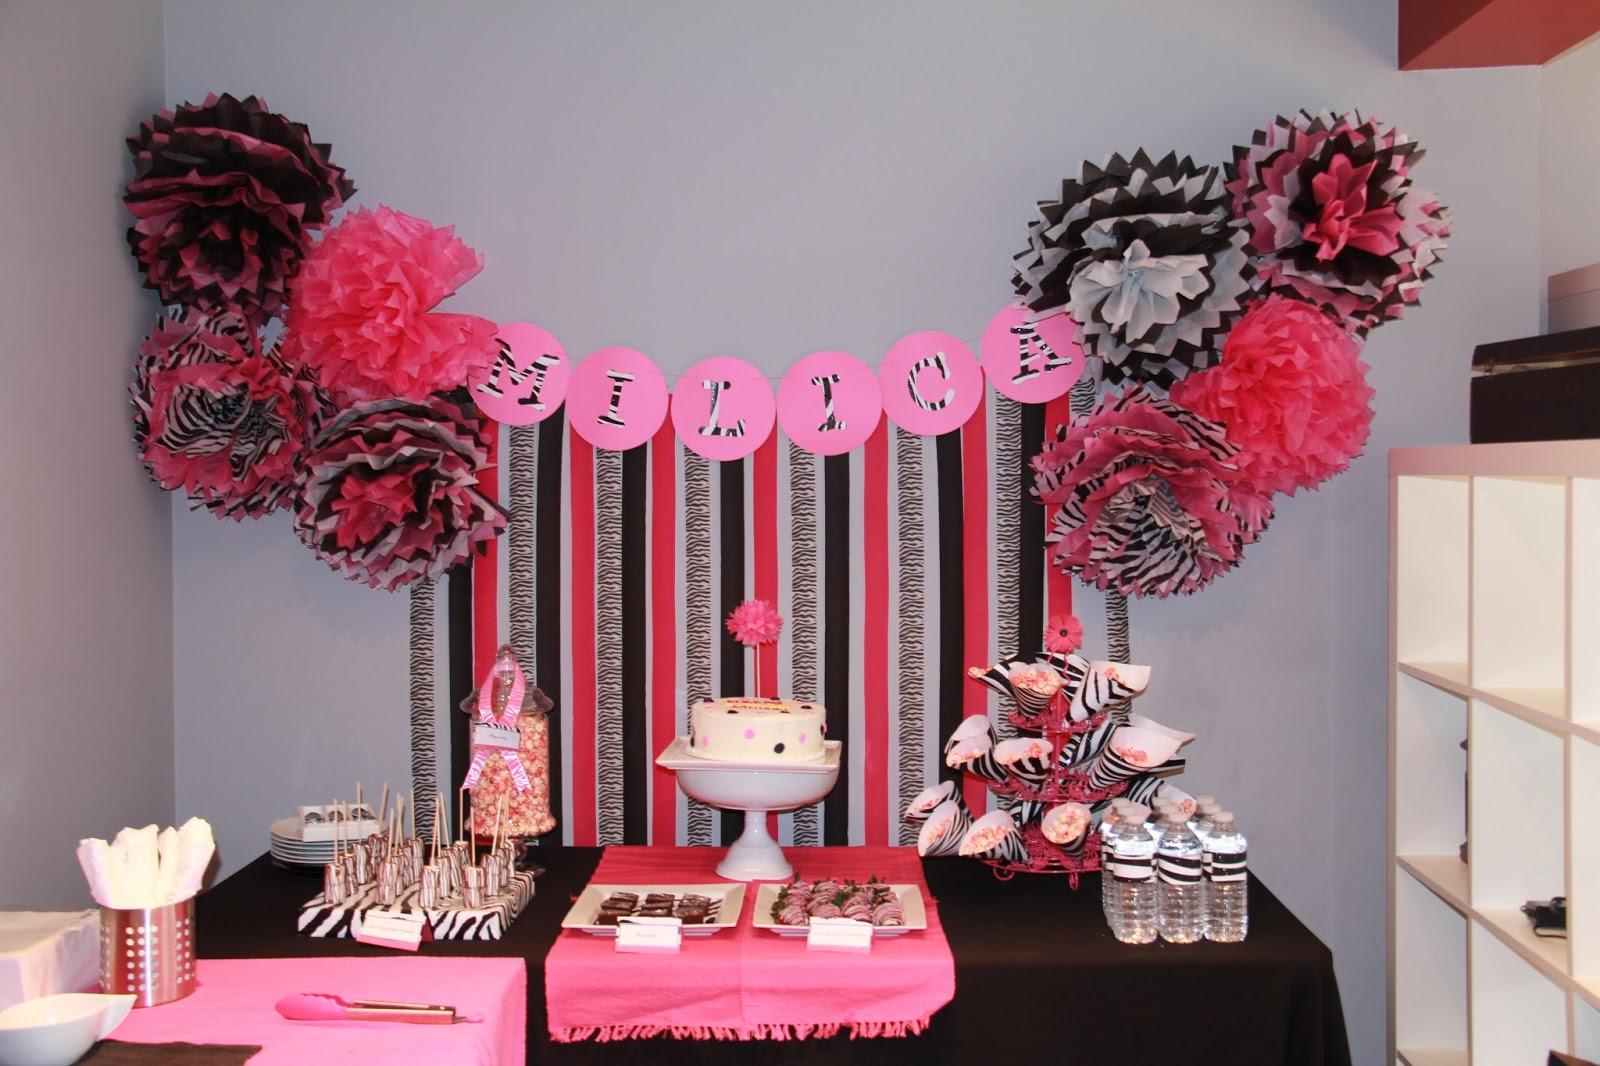 THREElittleBIRDS Events: Hot Pink and Zebra Print Party